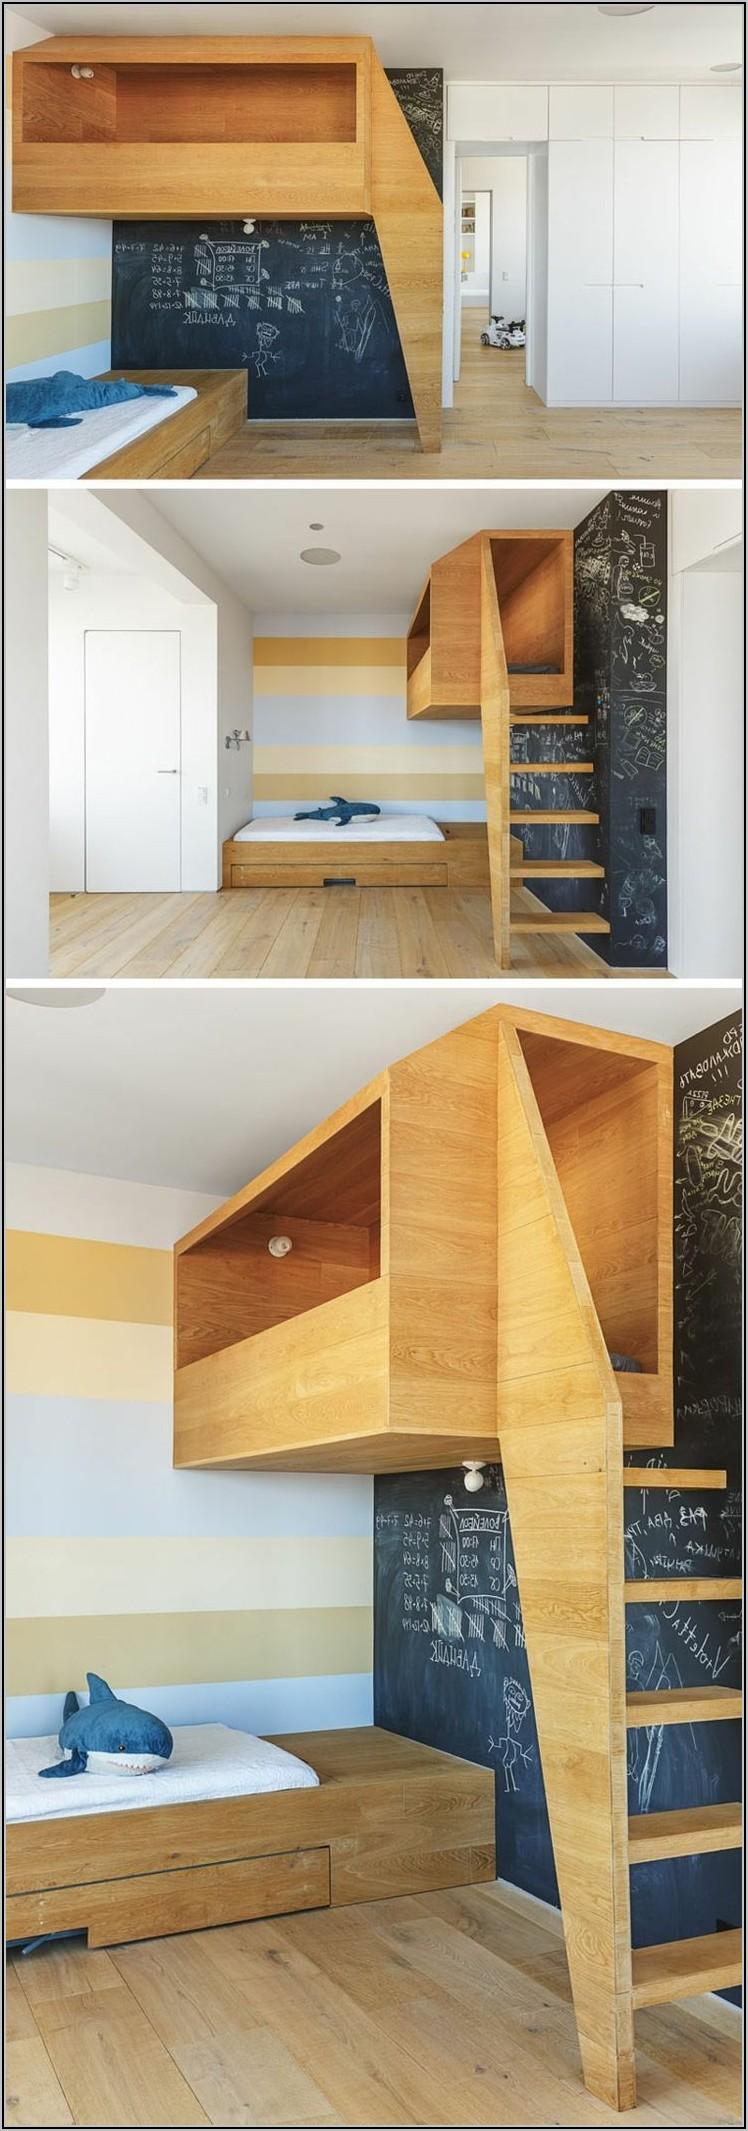 Spielhaus Kinderzimmer Holz